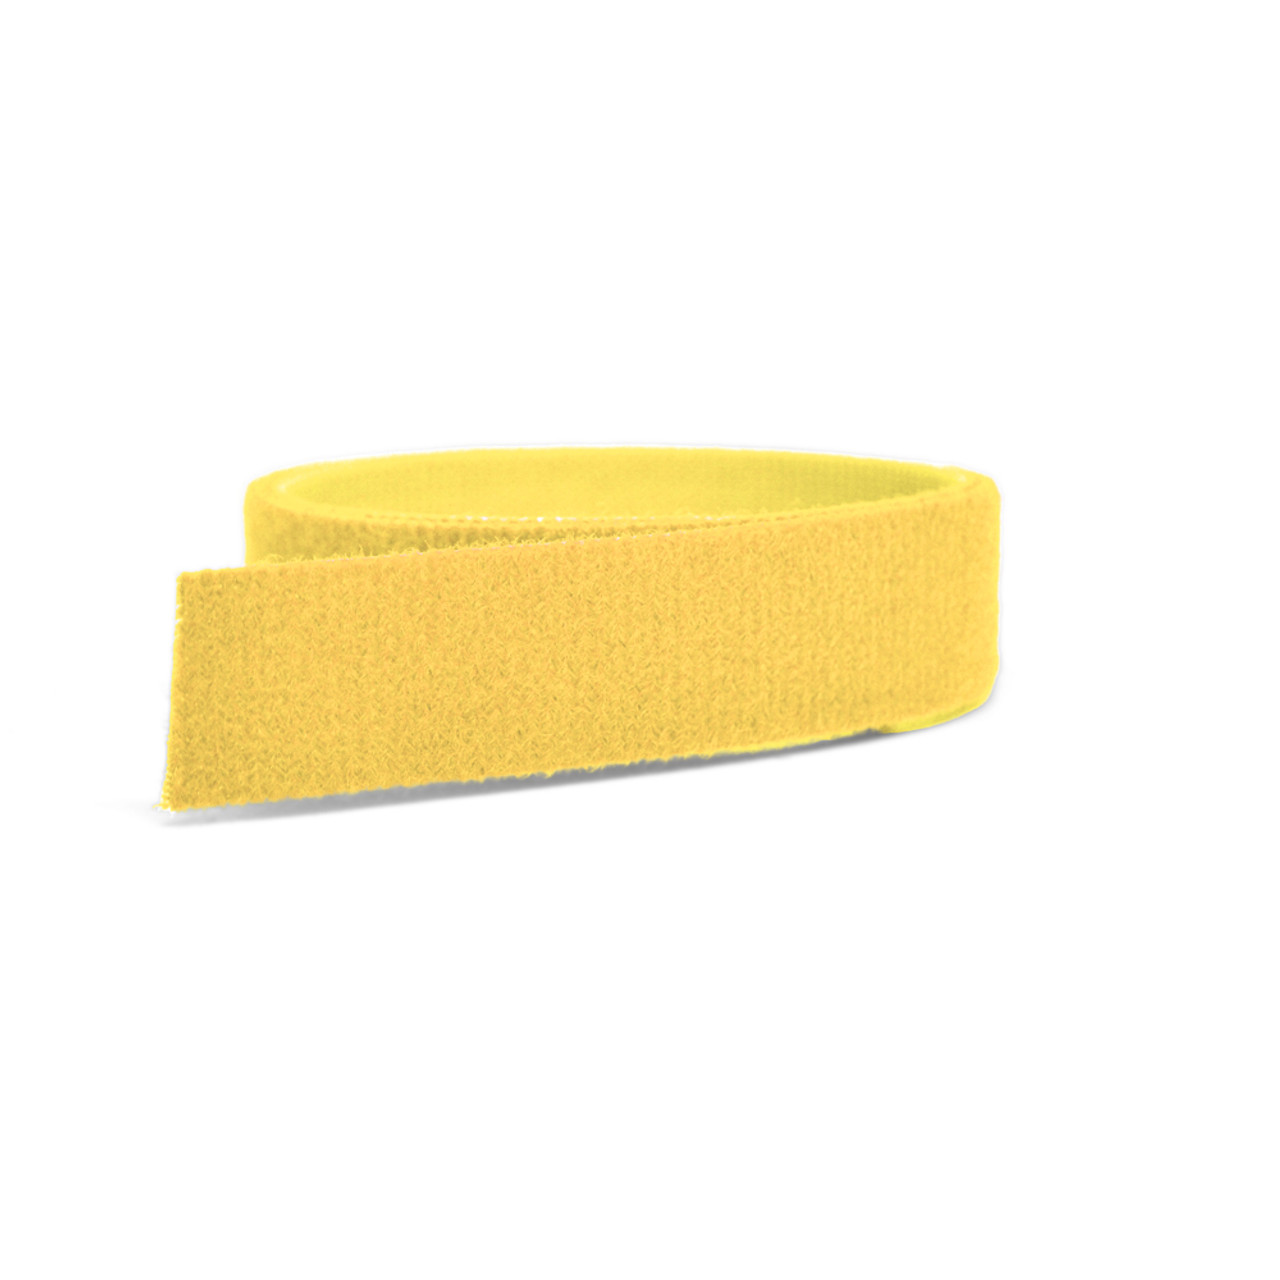 VELCRO® Brand ONE-WRAP® Tape Yellow Mini Rolls / Velcro Straps - Bundling Straps - Velcro Tie - Velcro Strap